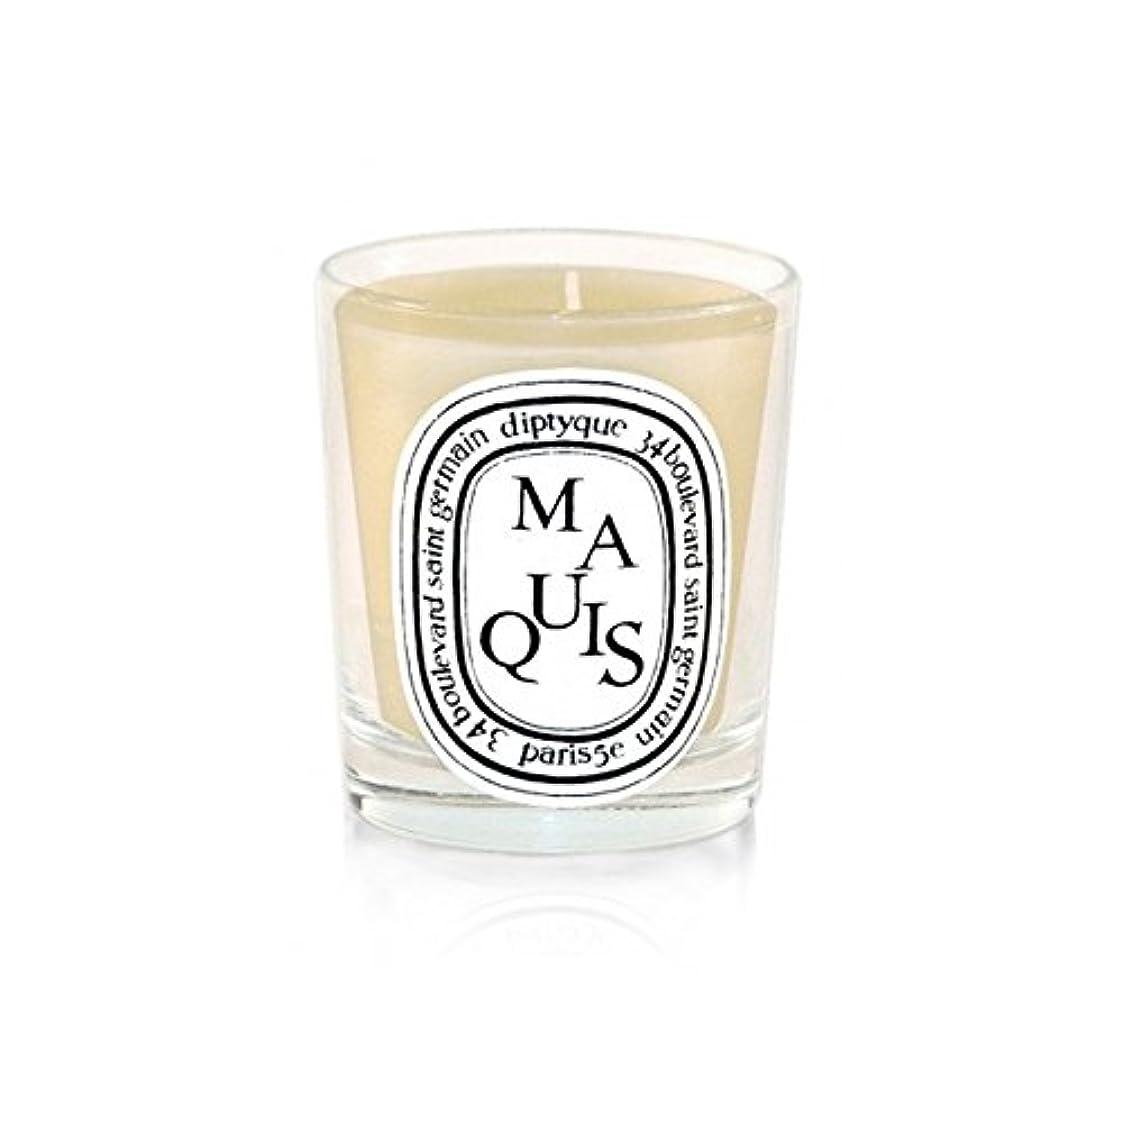 Diptyque Candle Maquis / Maquis 190g (Pack of 2) - Diptyqueキャンドルマキ/マキ190グラム (x2) [並行輸入品]